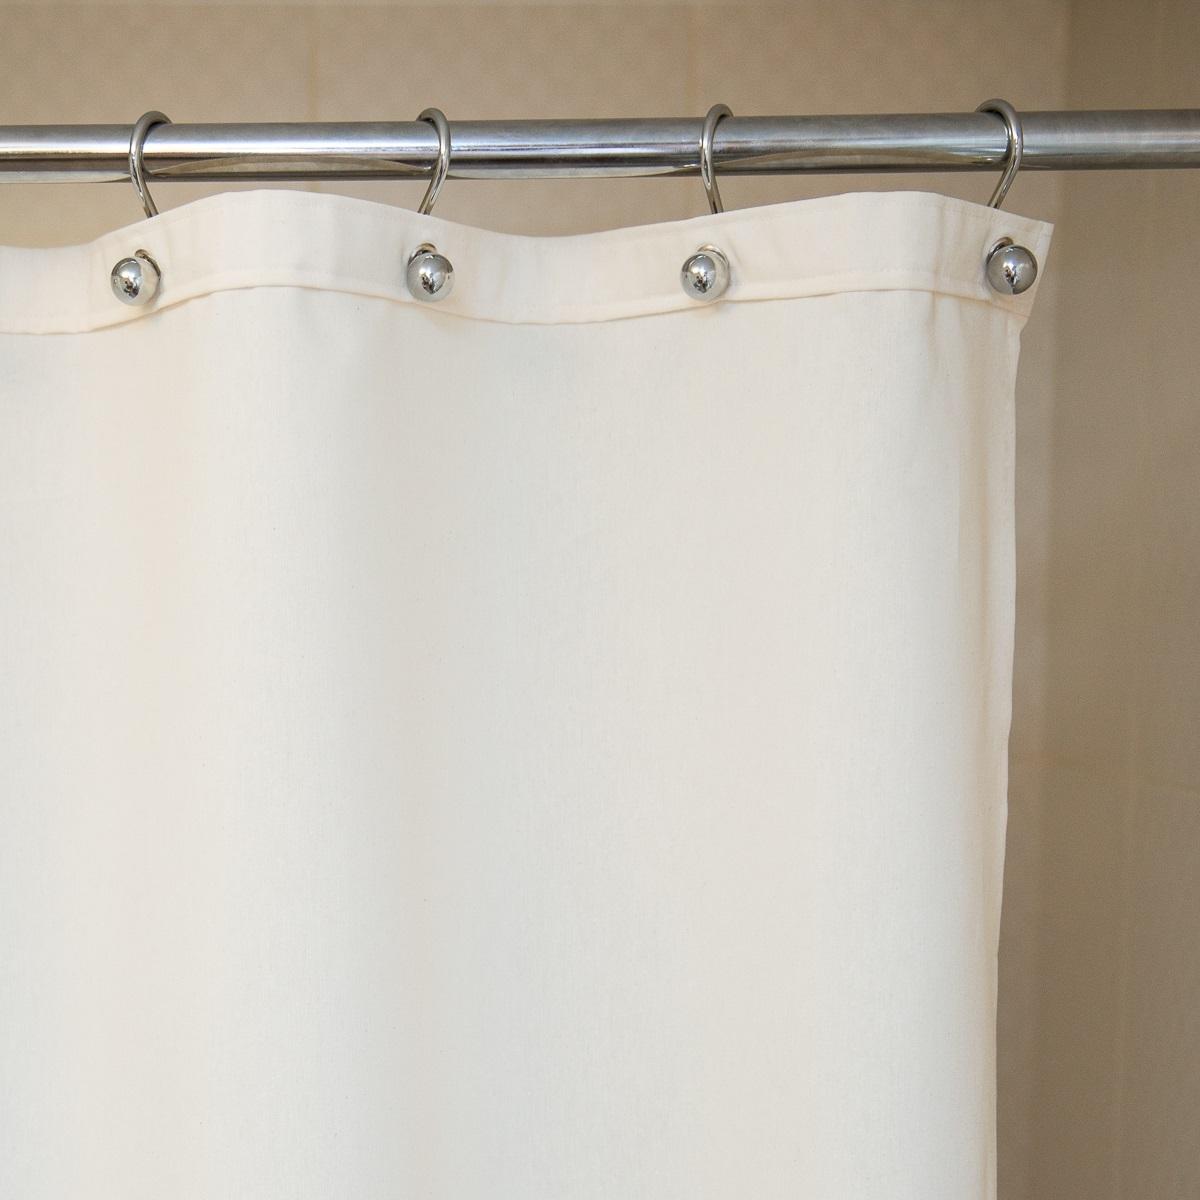 Шторки Защитная шторка для ванной 300х200 Arti-Deco Liso Beige elitnaya-shtorka-dlya-vannoy-240h200-liso-beige-ot-arti-deco-ispaniya.jpg